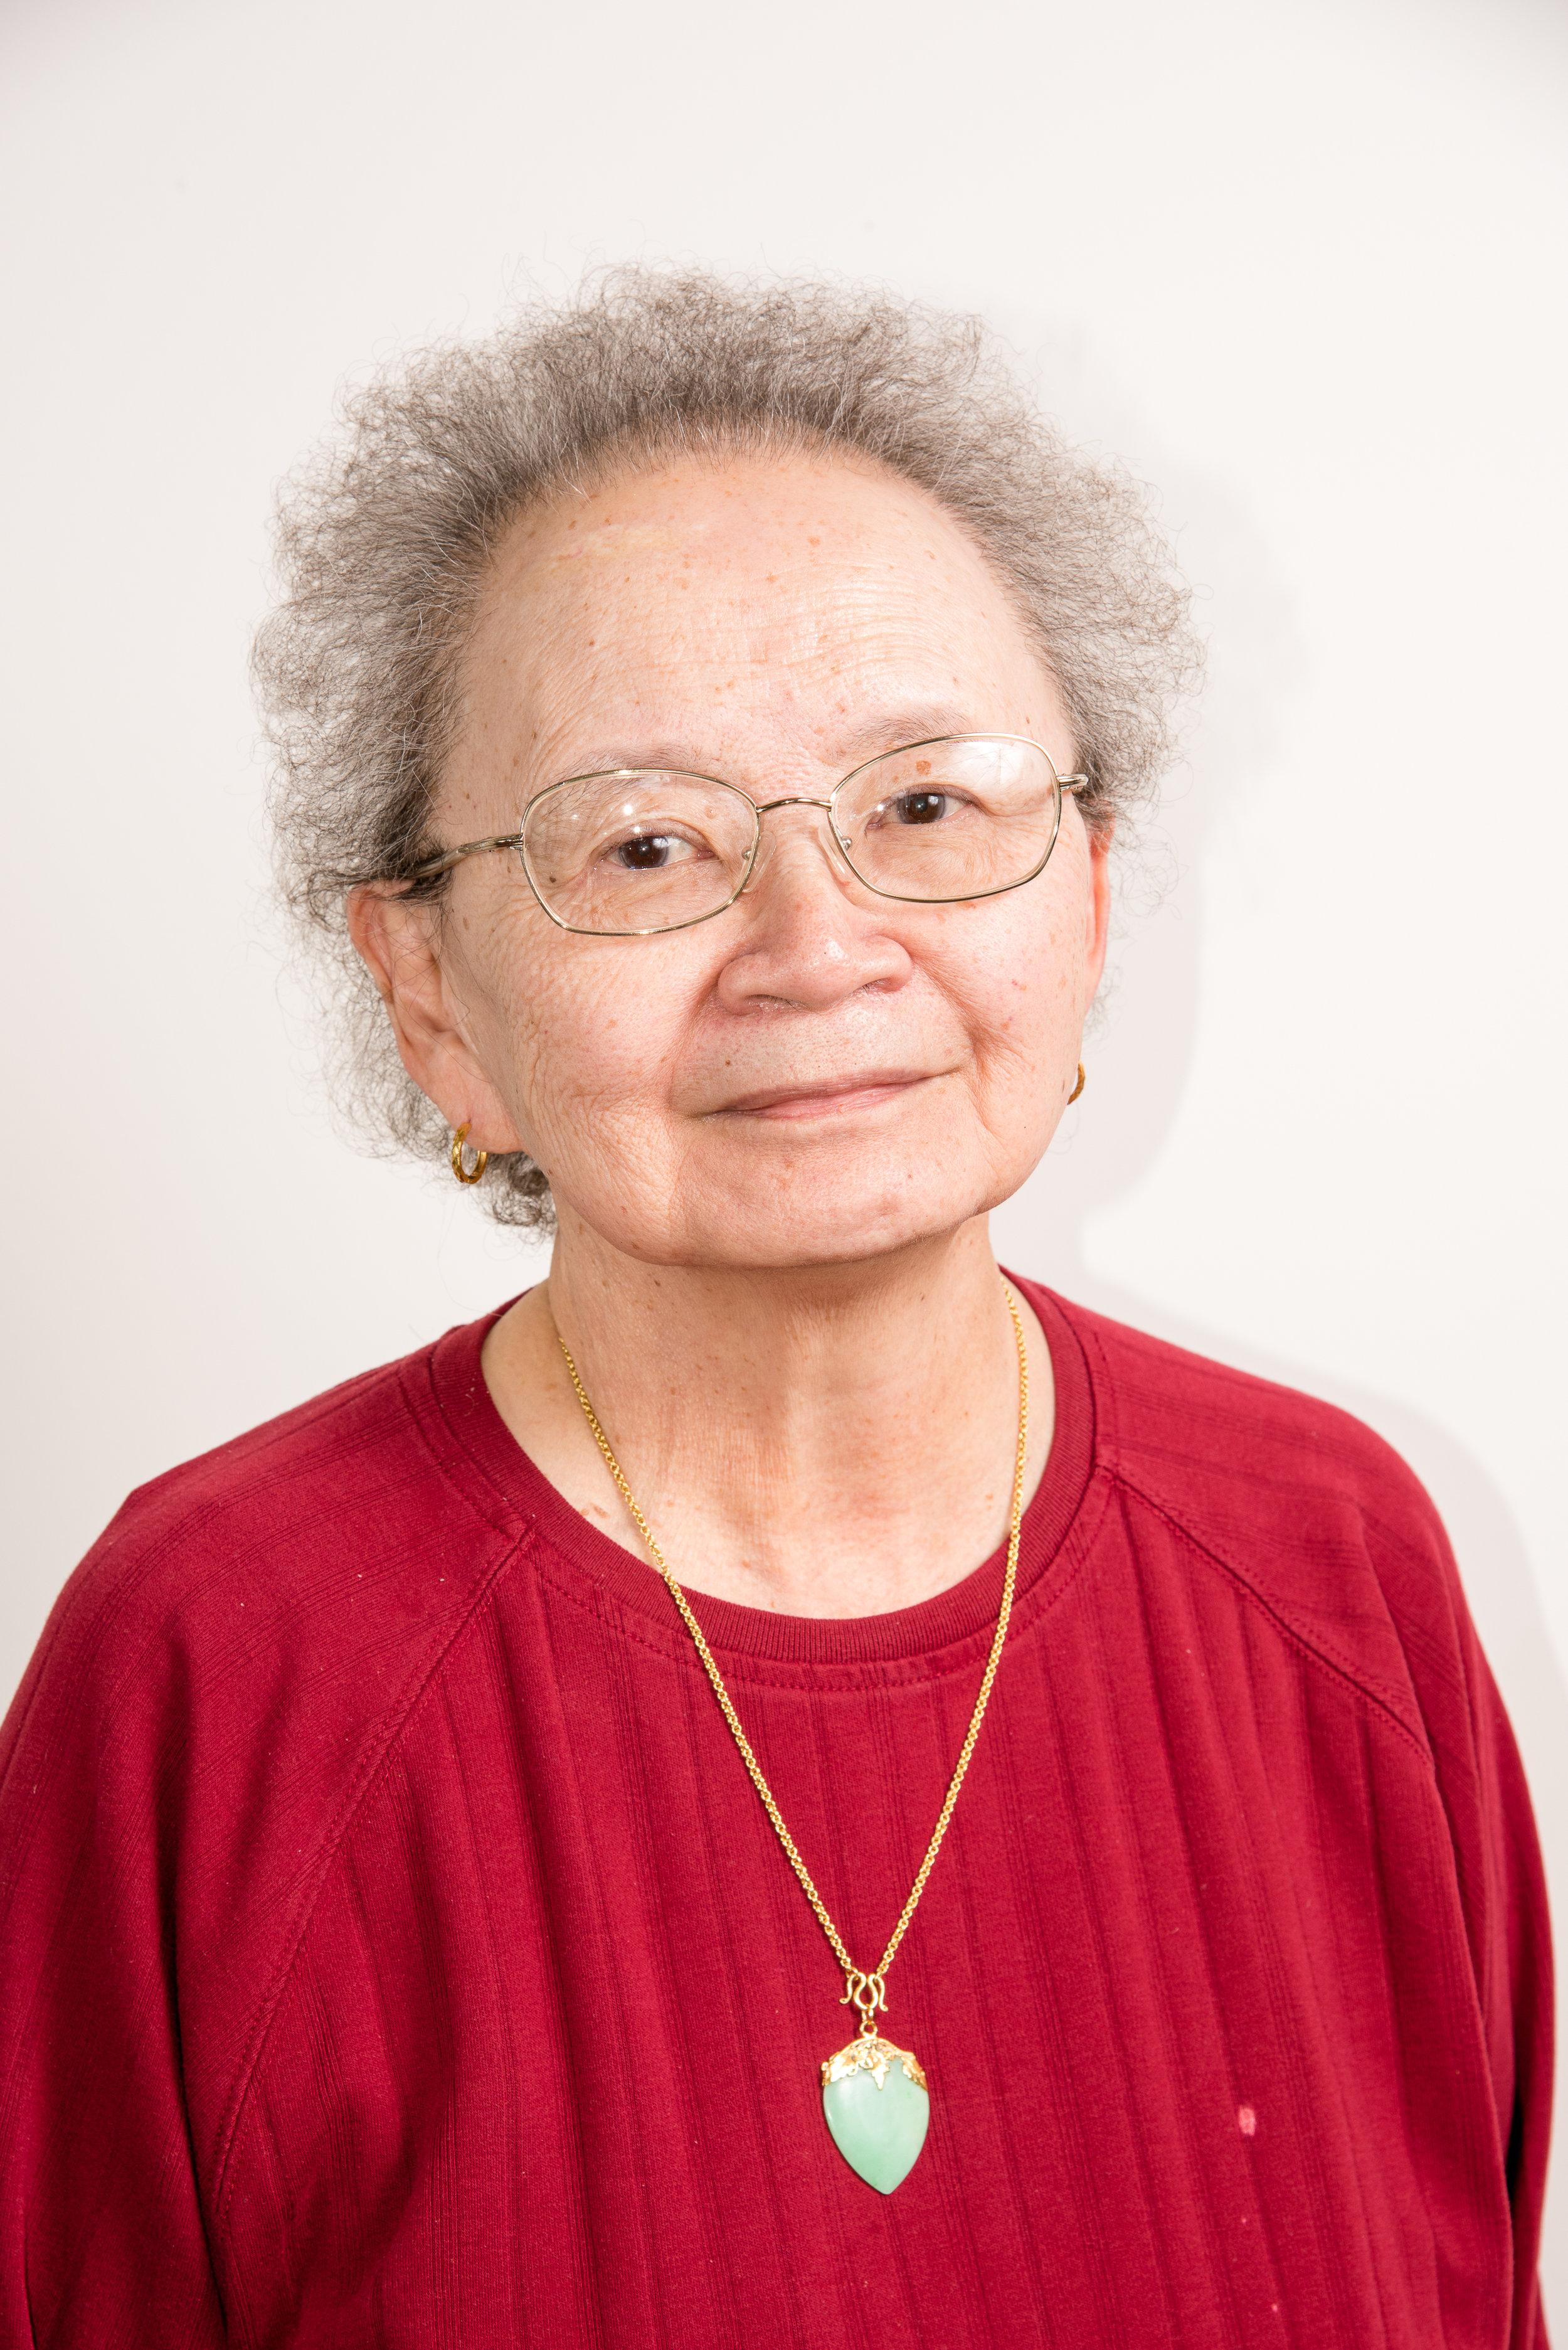 Verna Lee 國全夫人